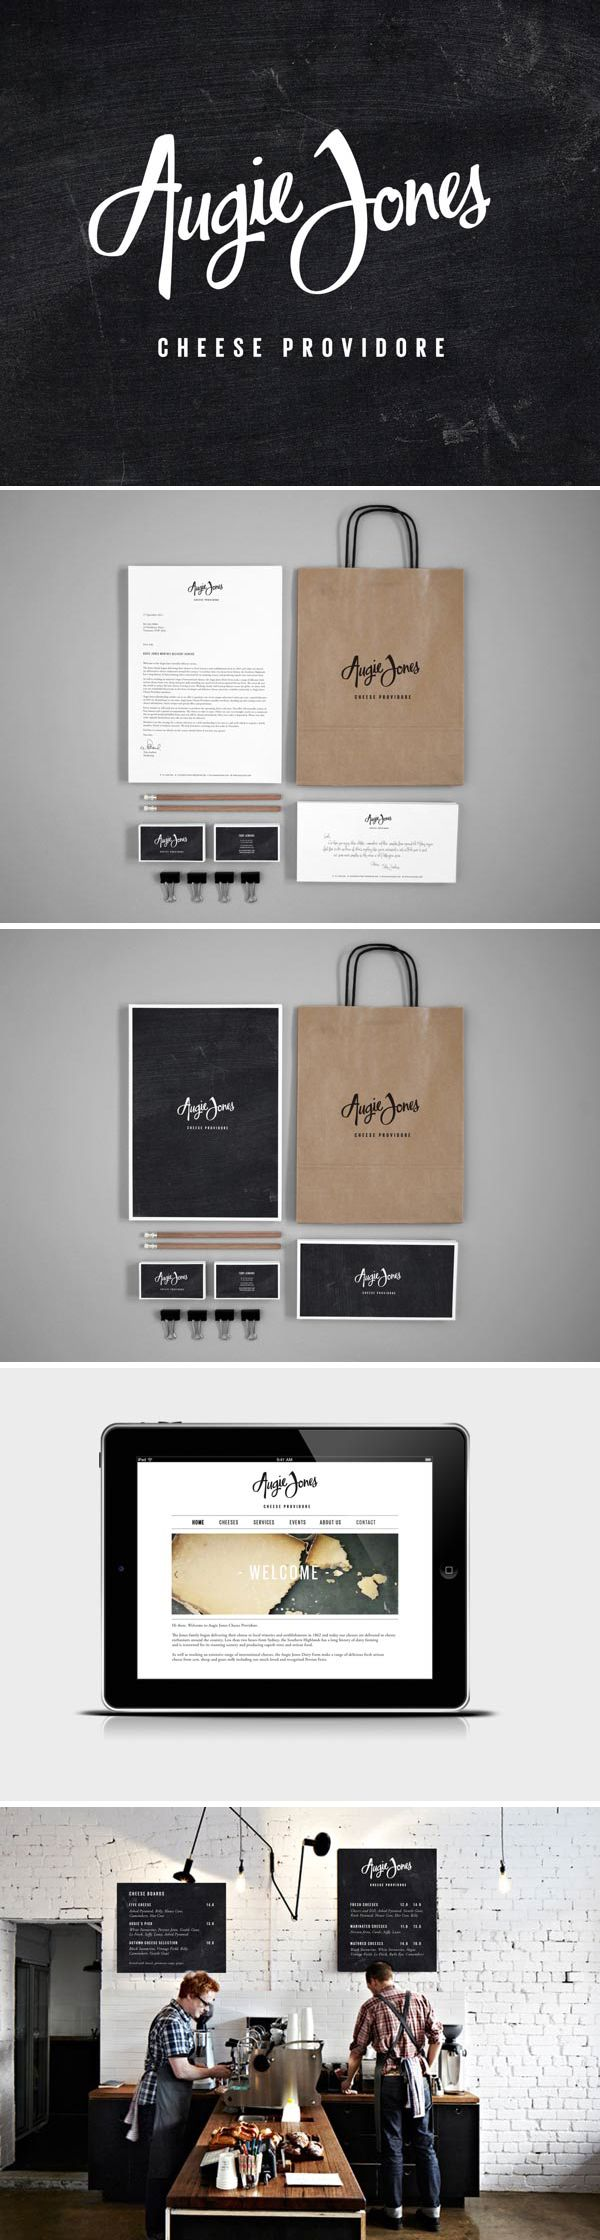 identity / Augie Jones - cheese | #stationary #corporate #design #corporatedesign #identity #branding #marketing